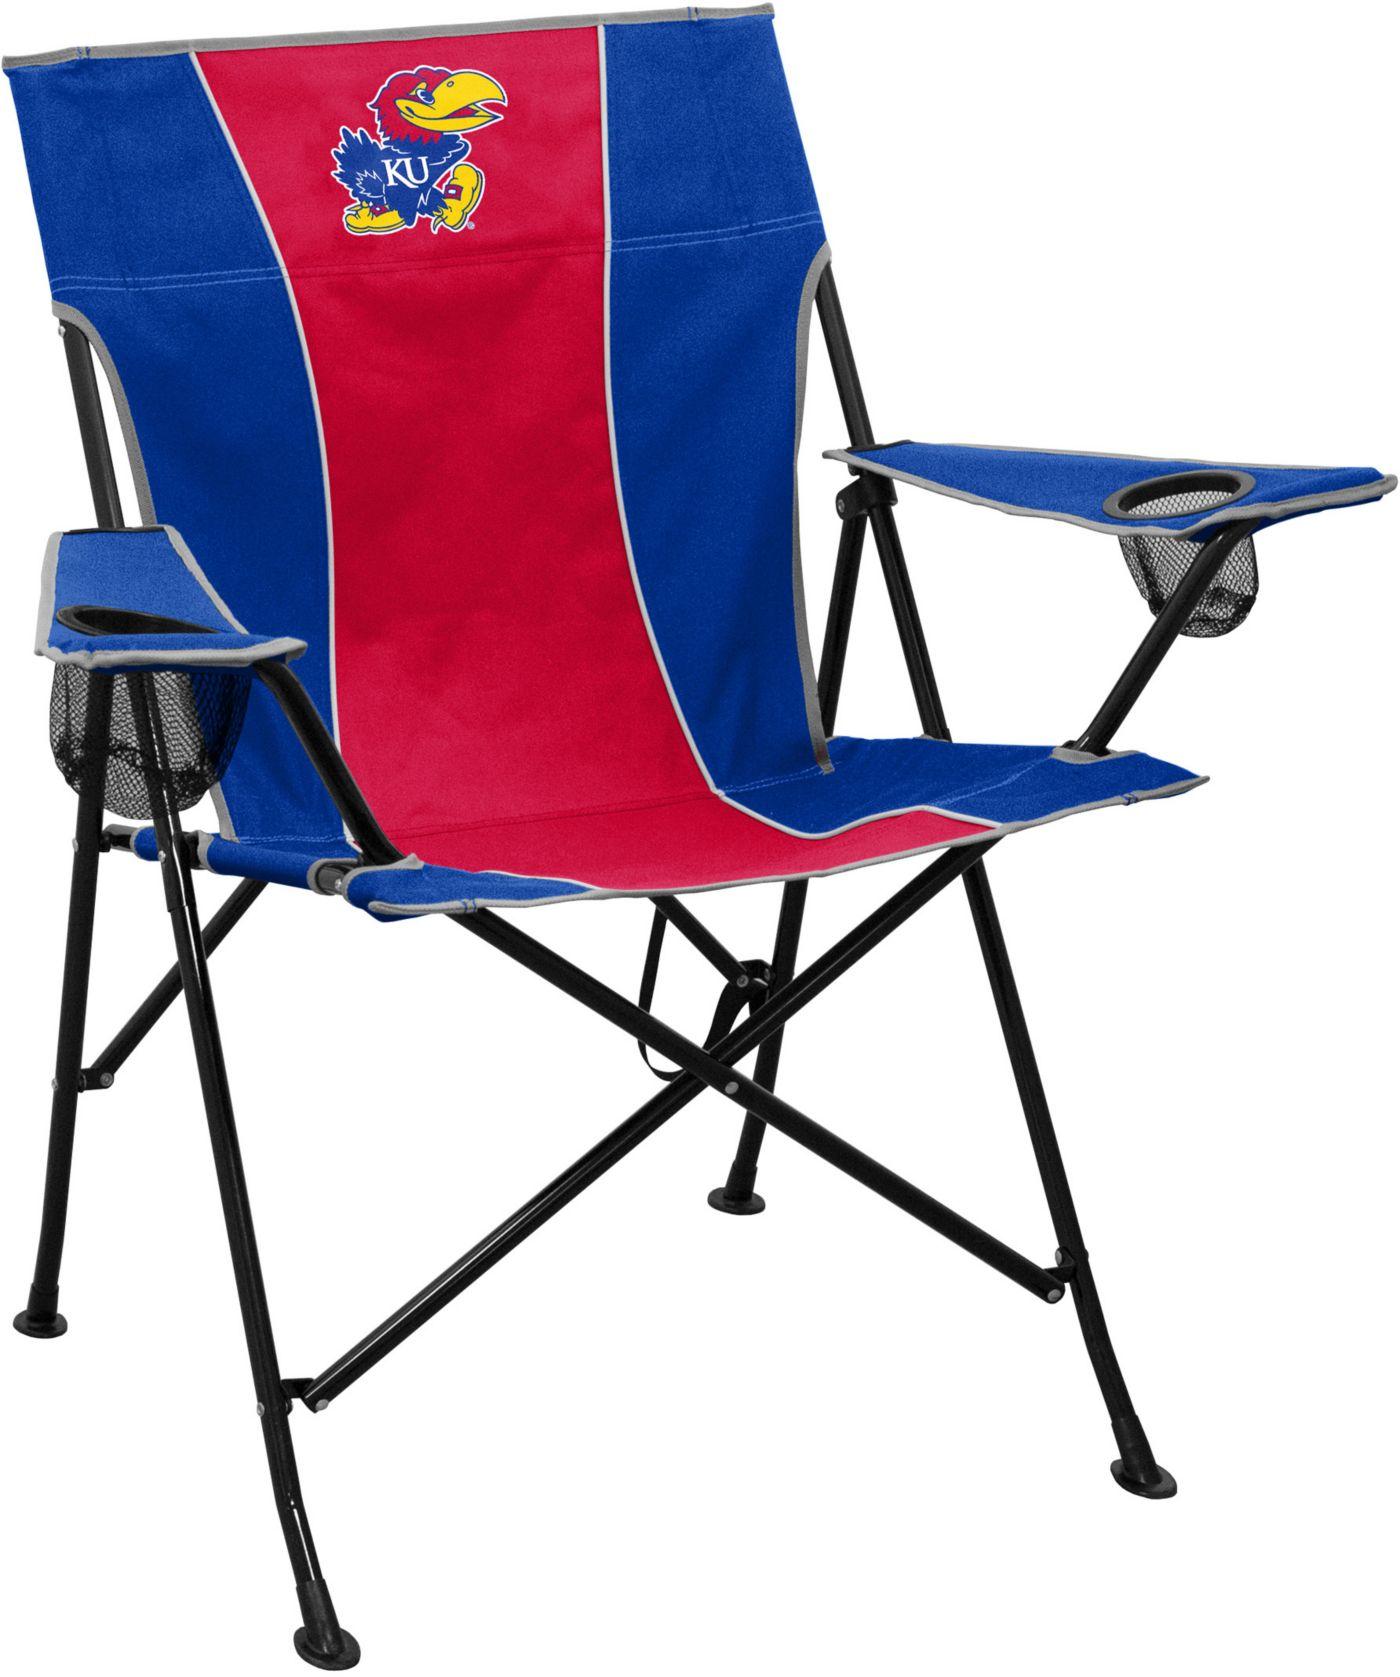 Kansas Jayhawks Pregame Chair